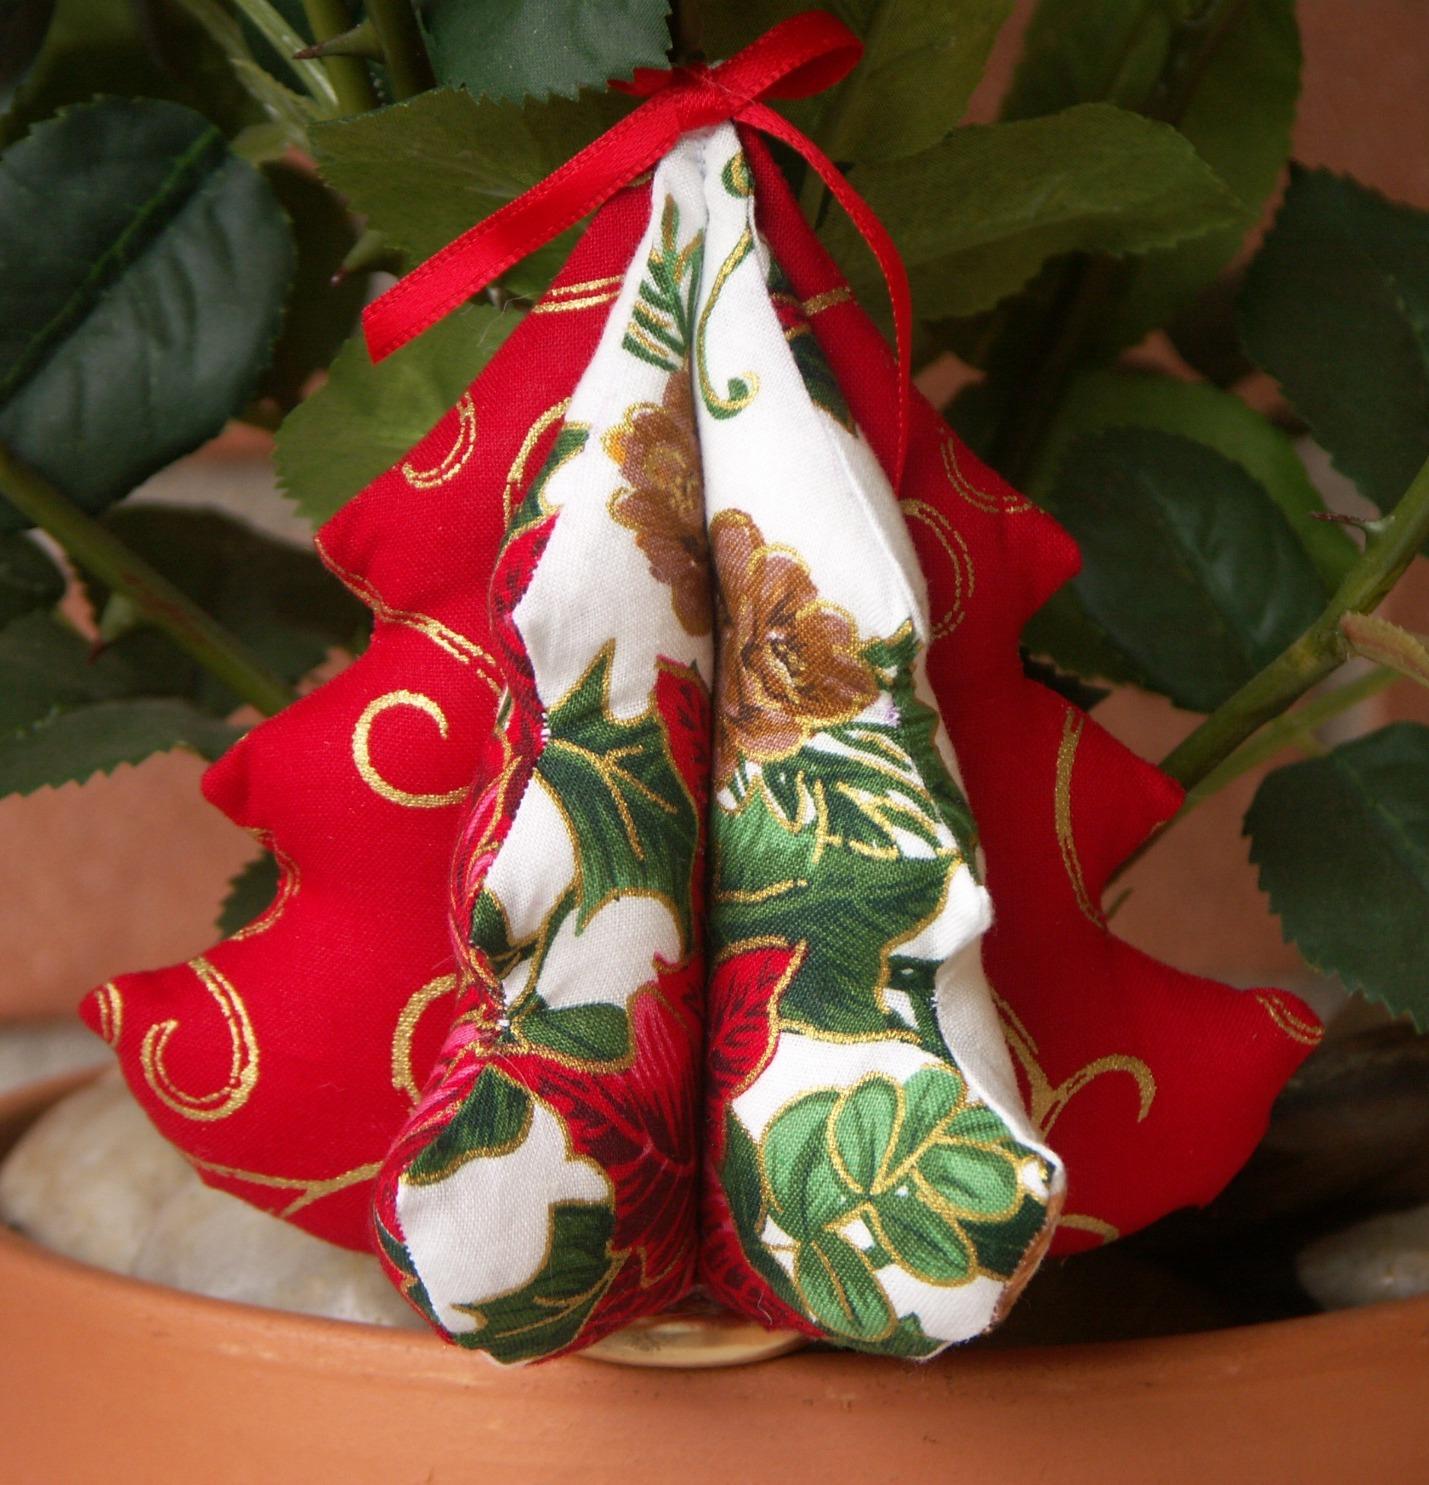 Favoloso Tatamusetta: Immancabili alberi di Natale UD38